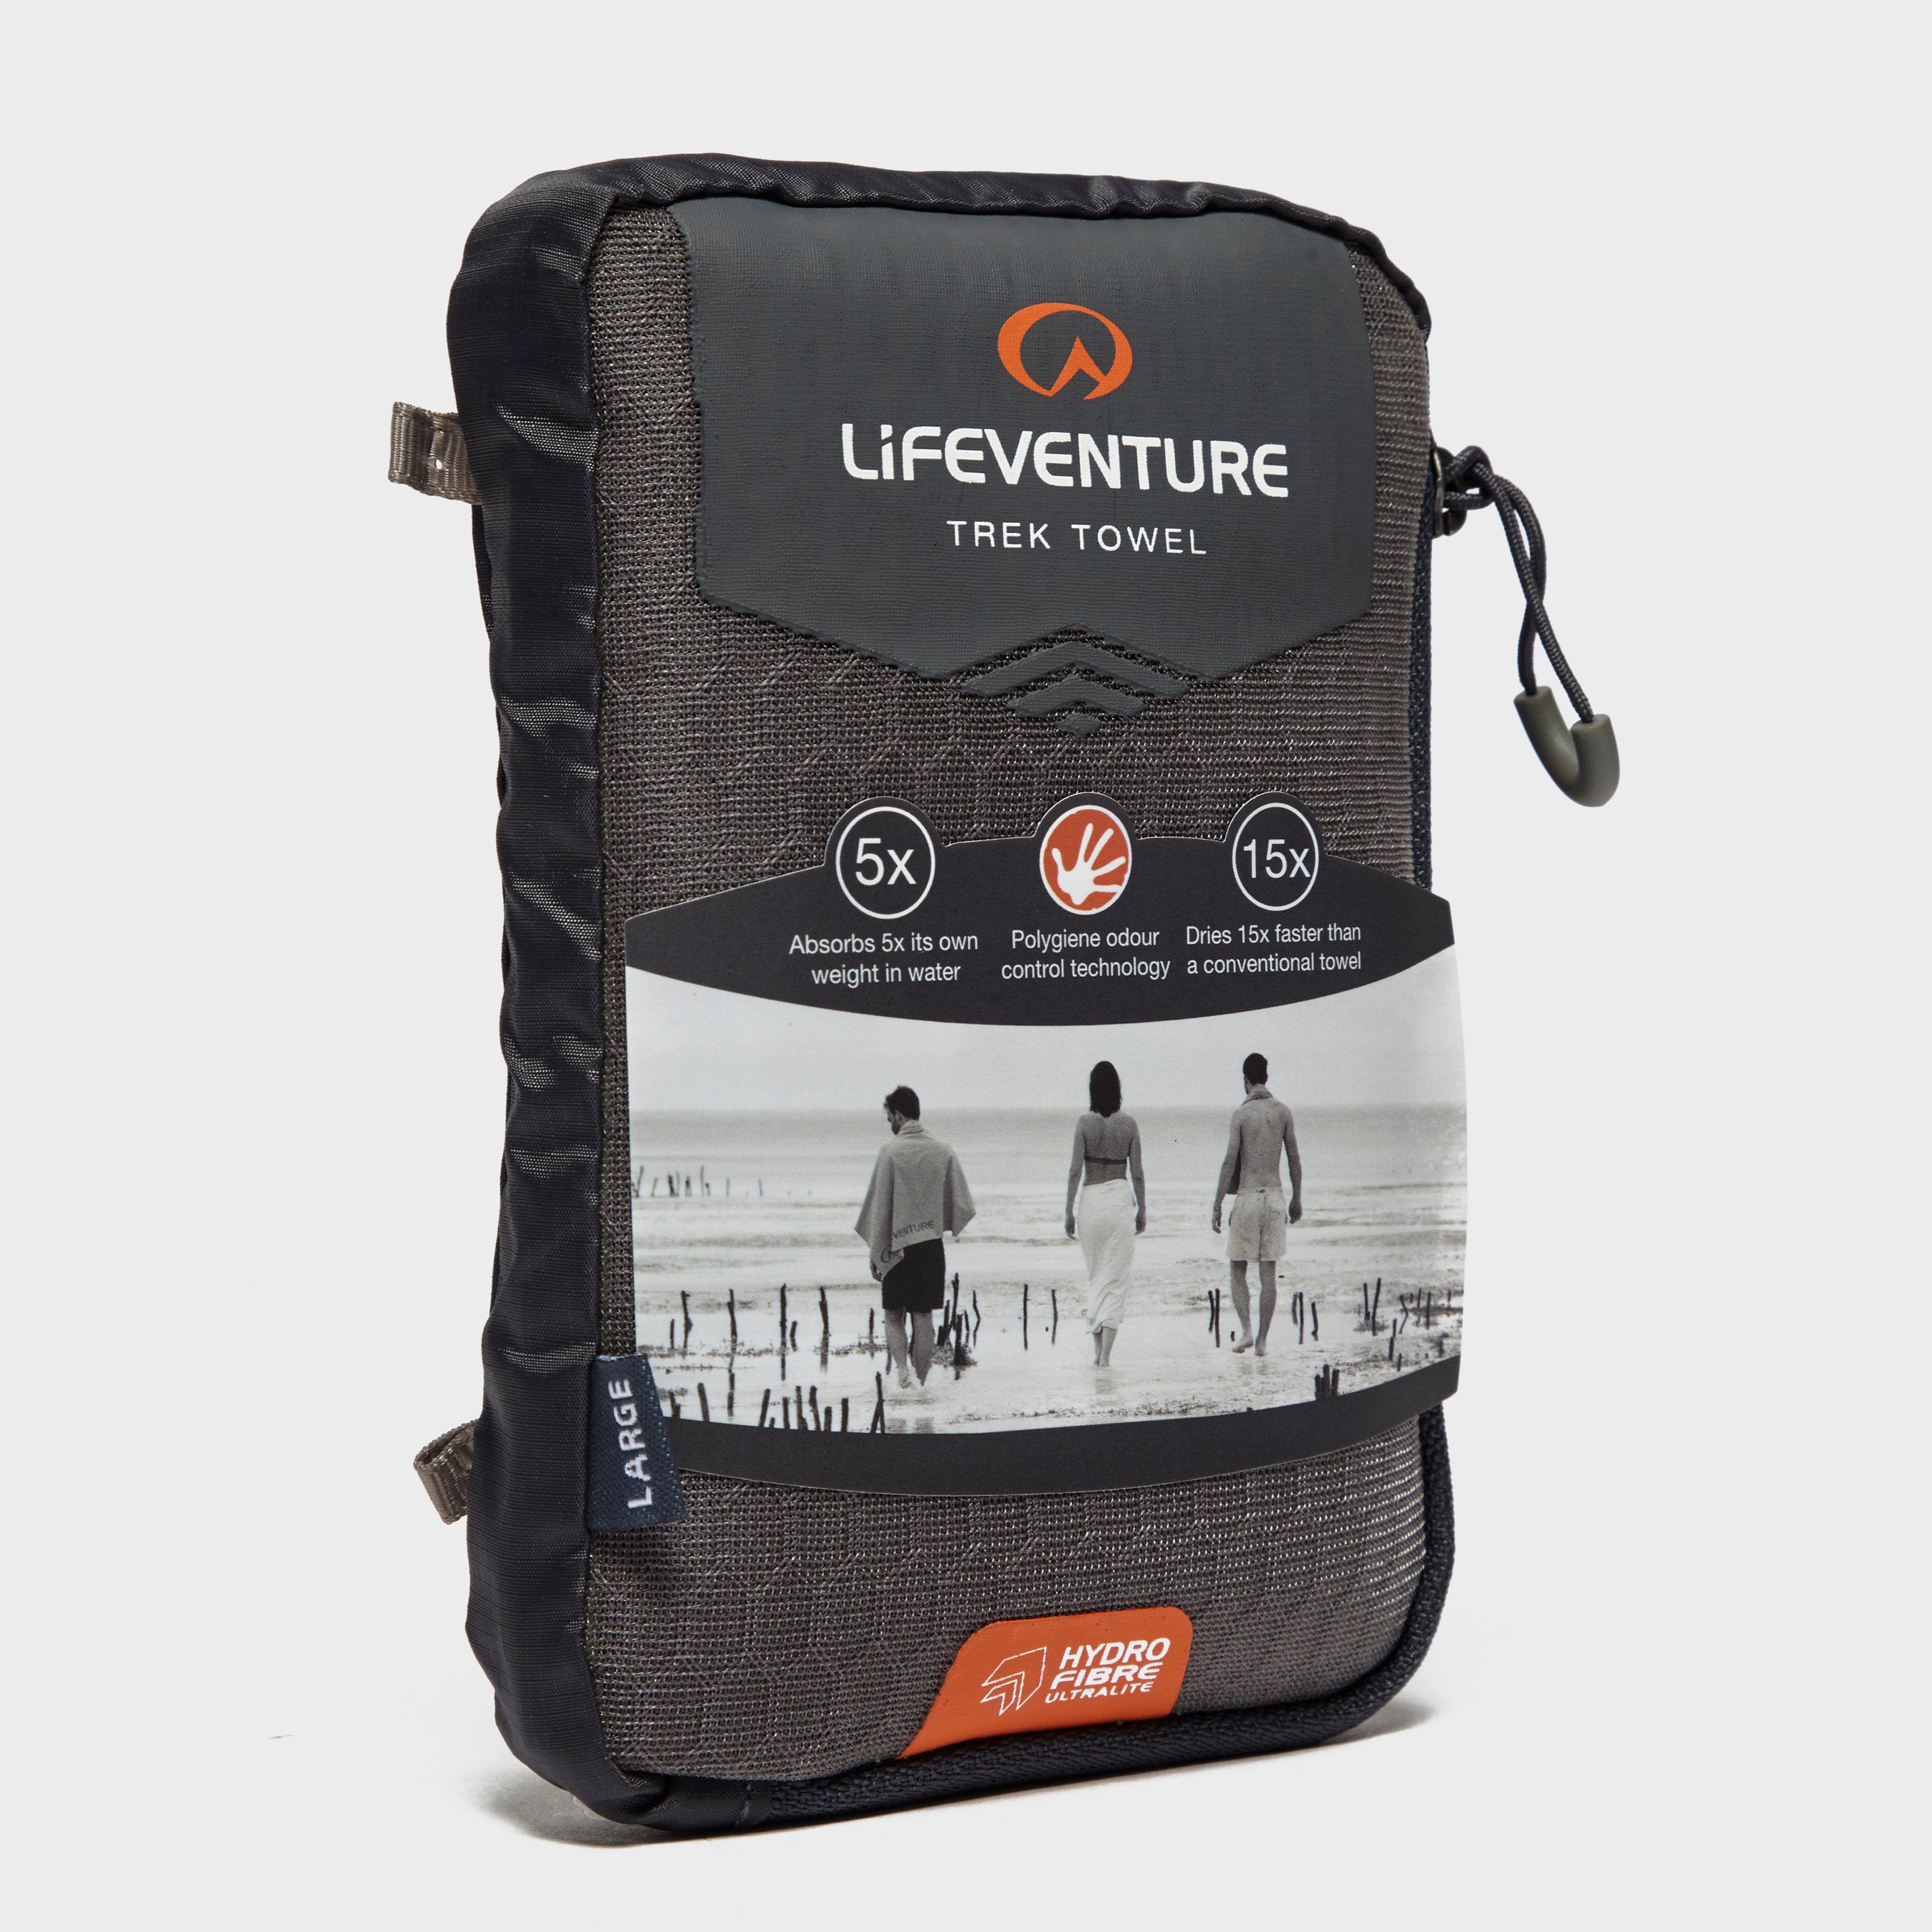 LIFEVENTURE Hydro Fibre UltraLite Travel Towel Large